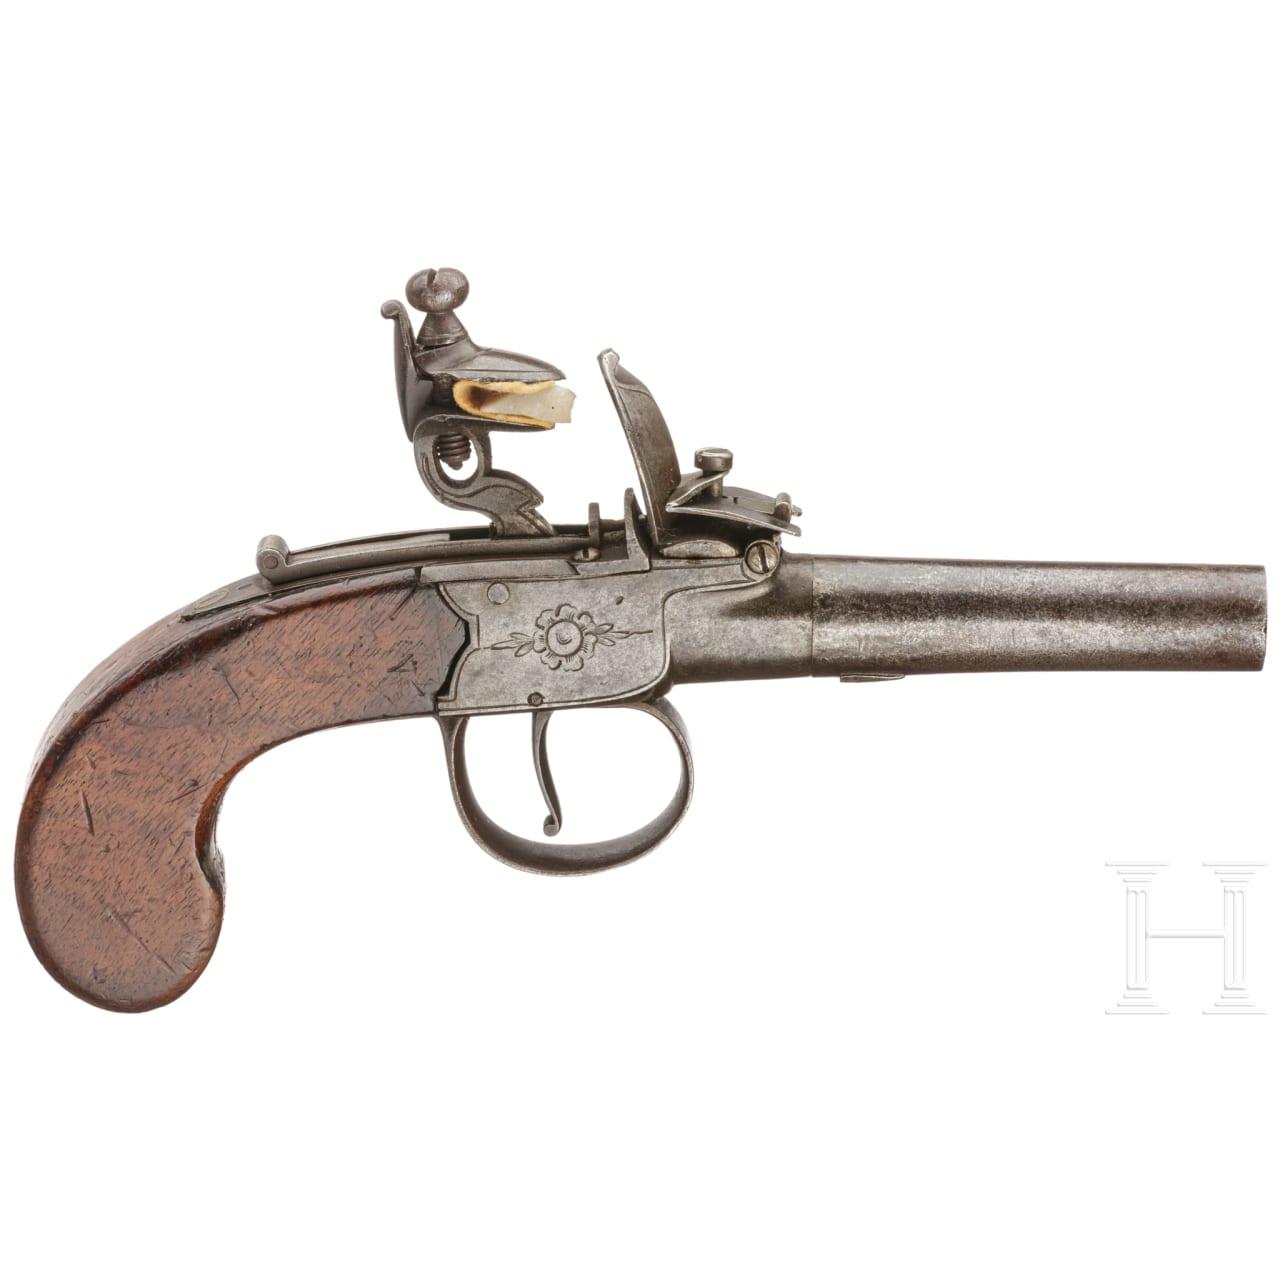 A flintlock pocket pistol by Rogers, England, circa 1800